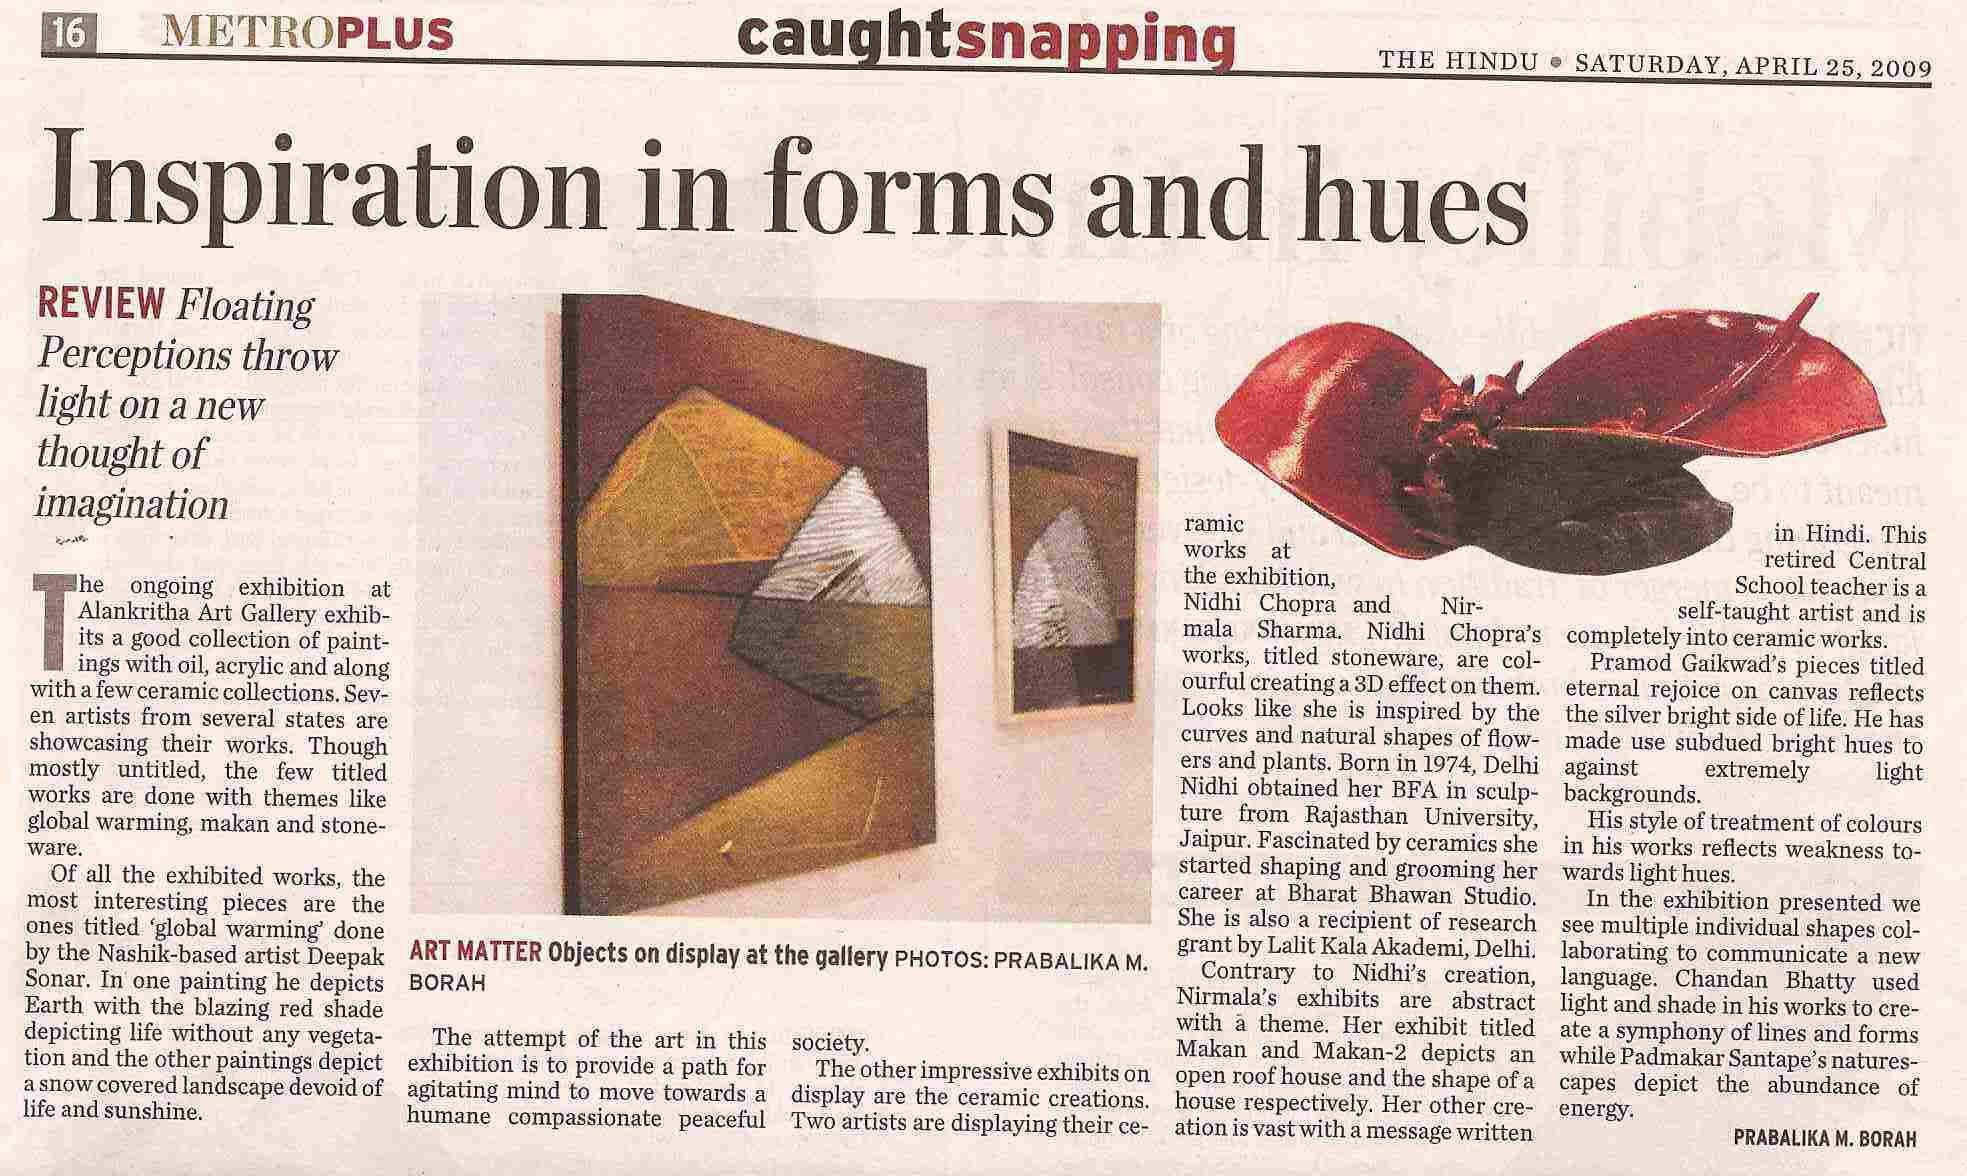 2009 Apr 5 The Hindu